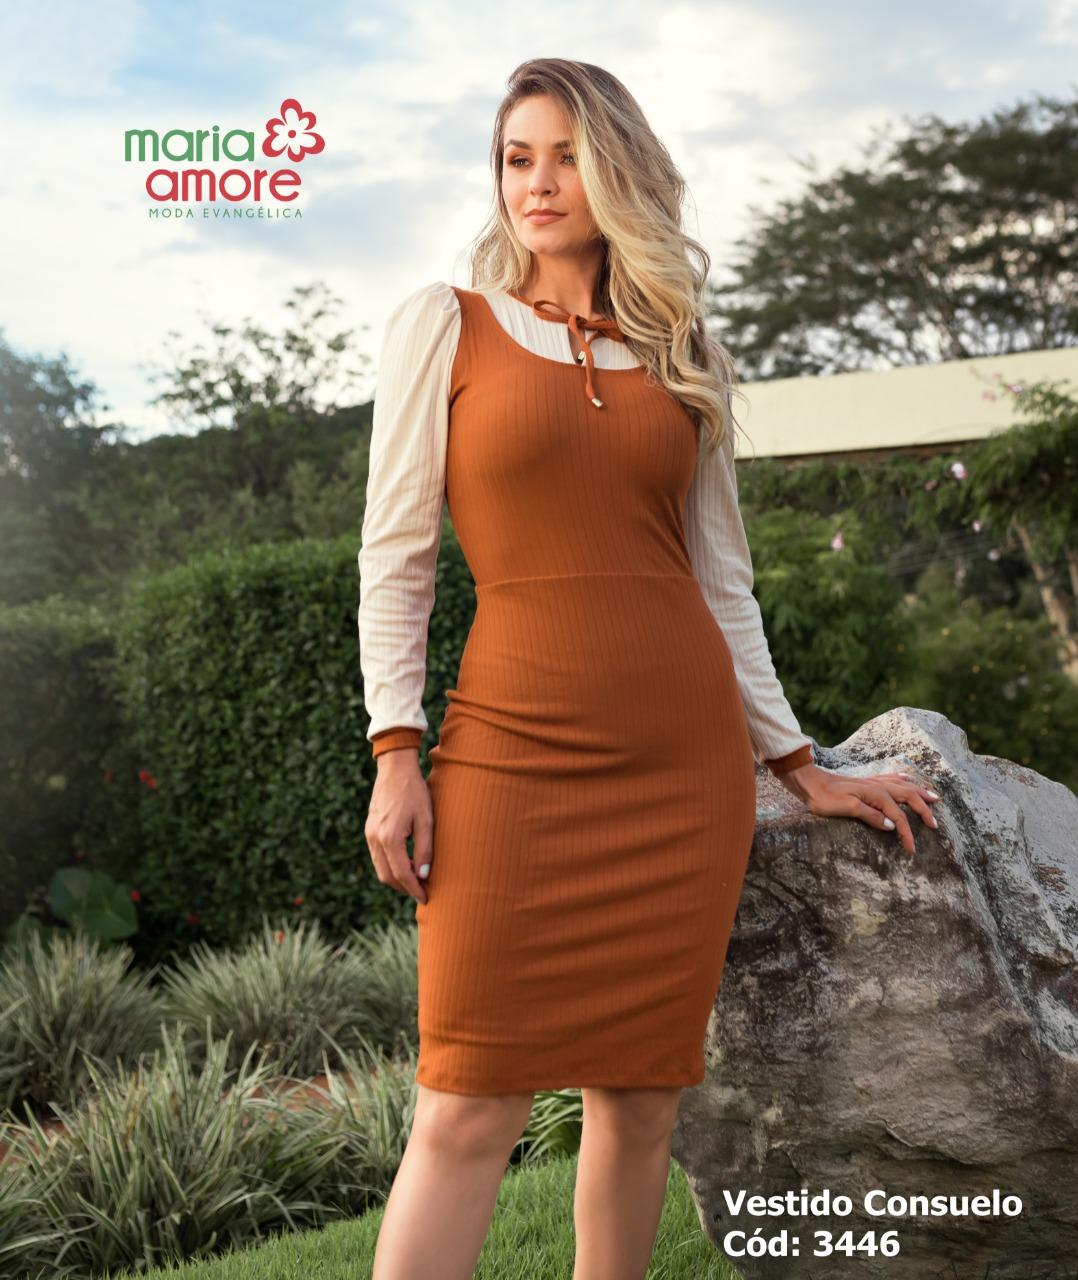 Vestido feminino canelado Lilian Maria Amore